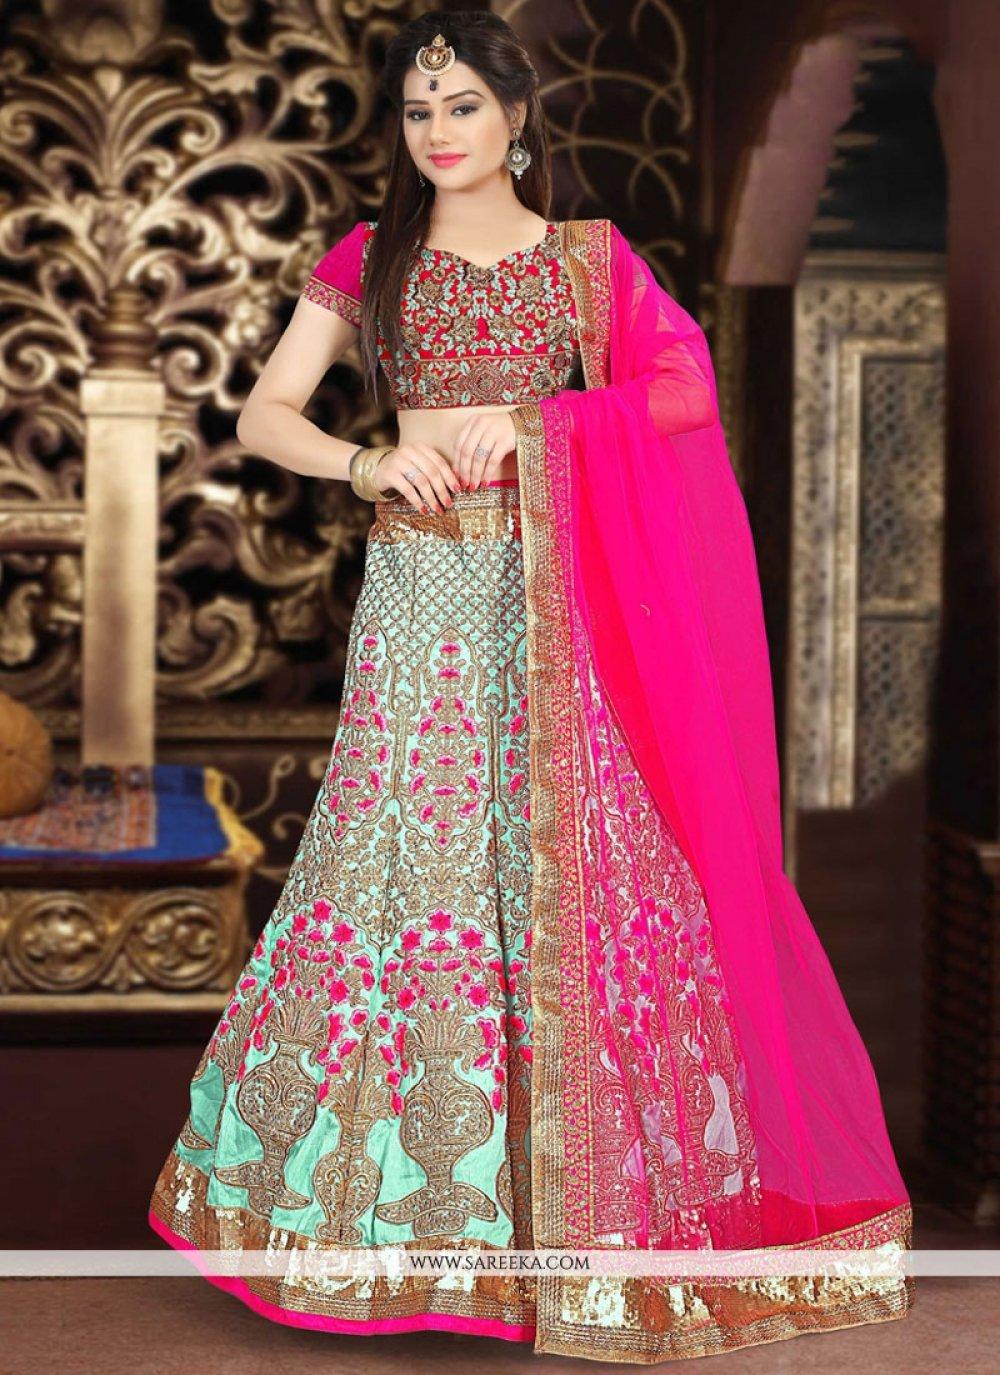 Hot Pink and Turquoise Embroidered Work Art Silk Lehenga Choli